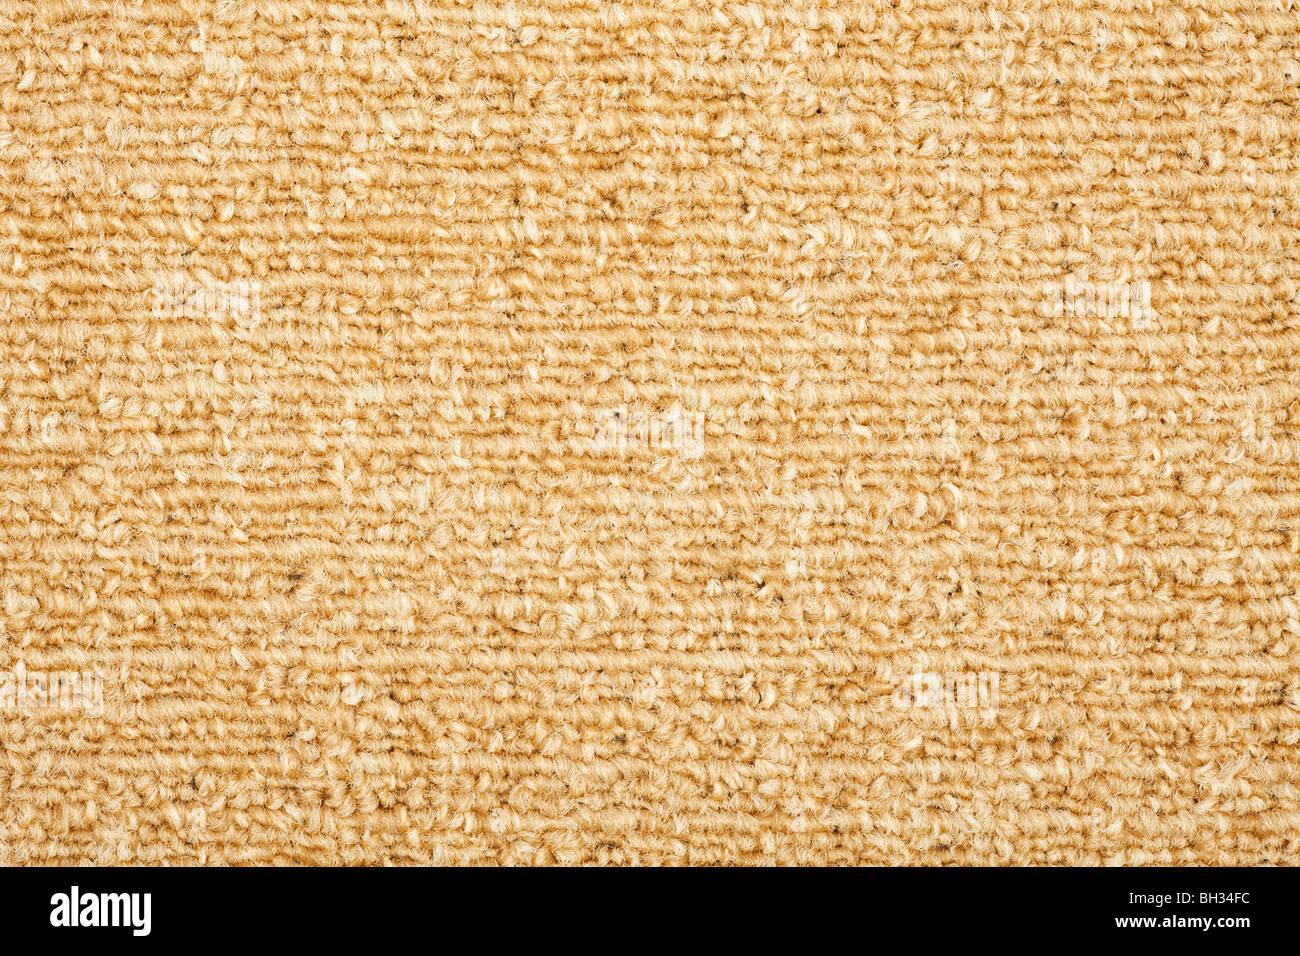 Carpet close up background texture - Stock Image